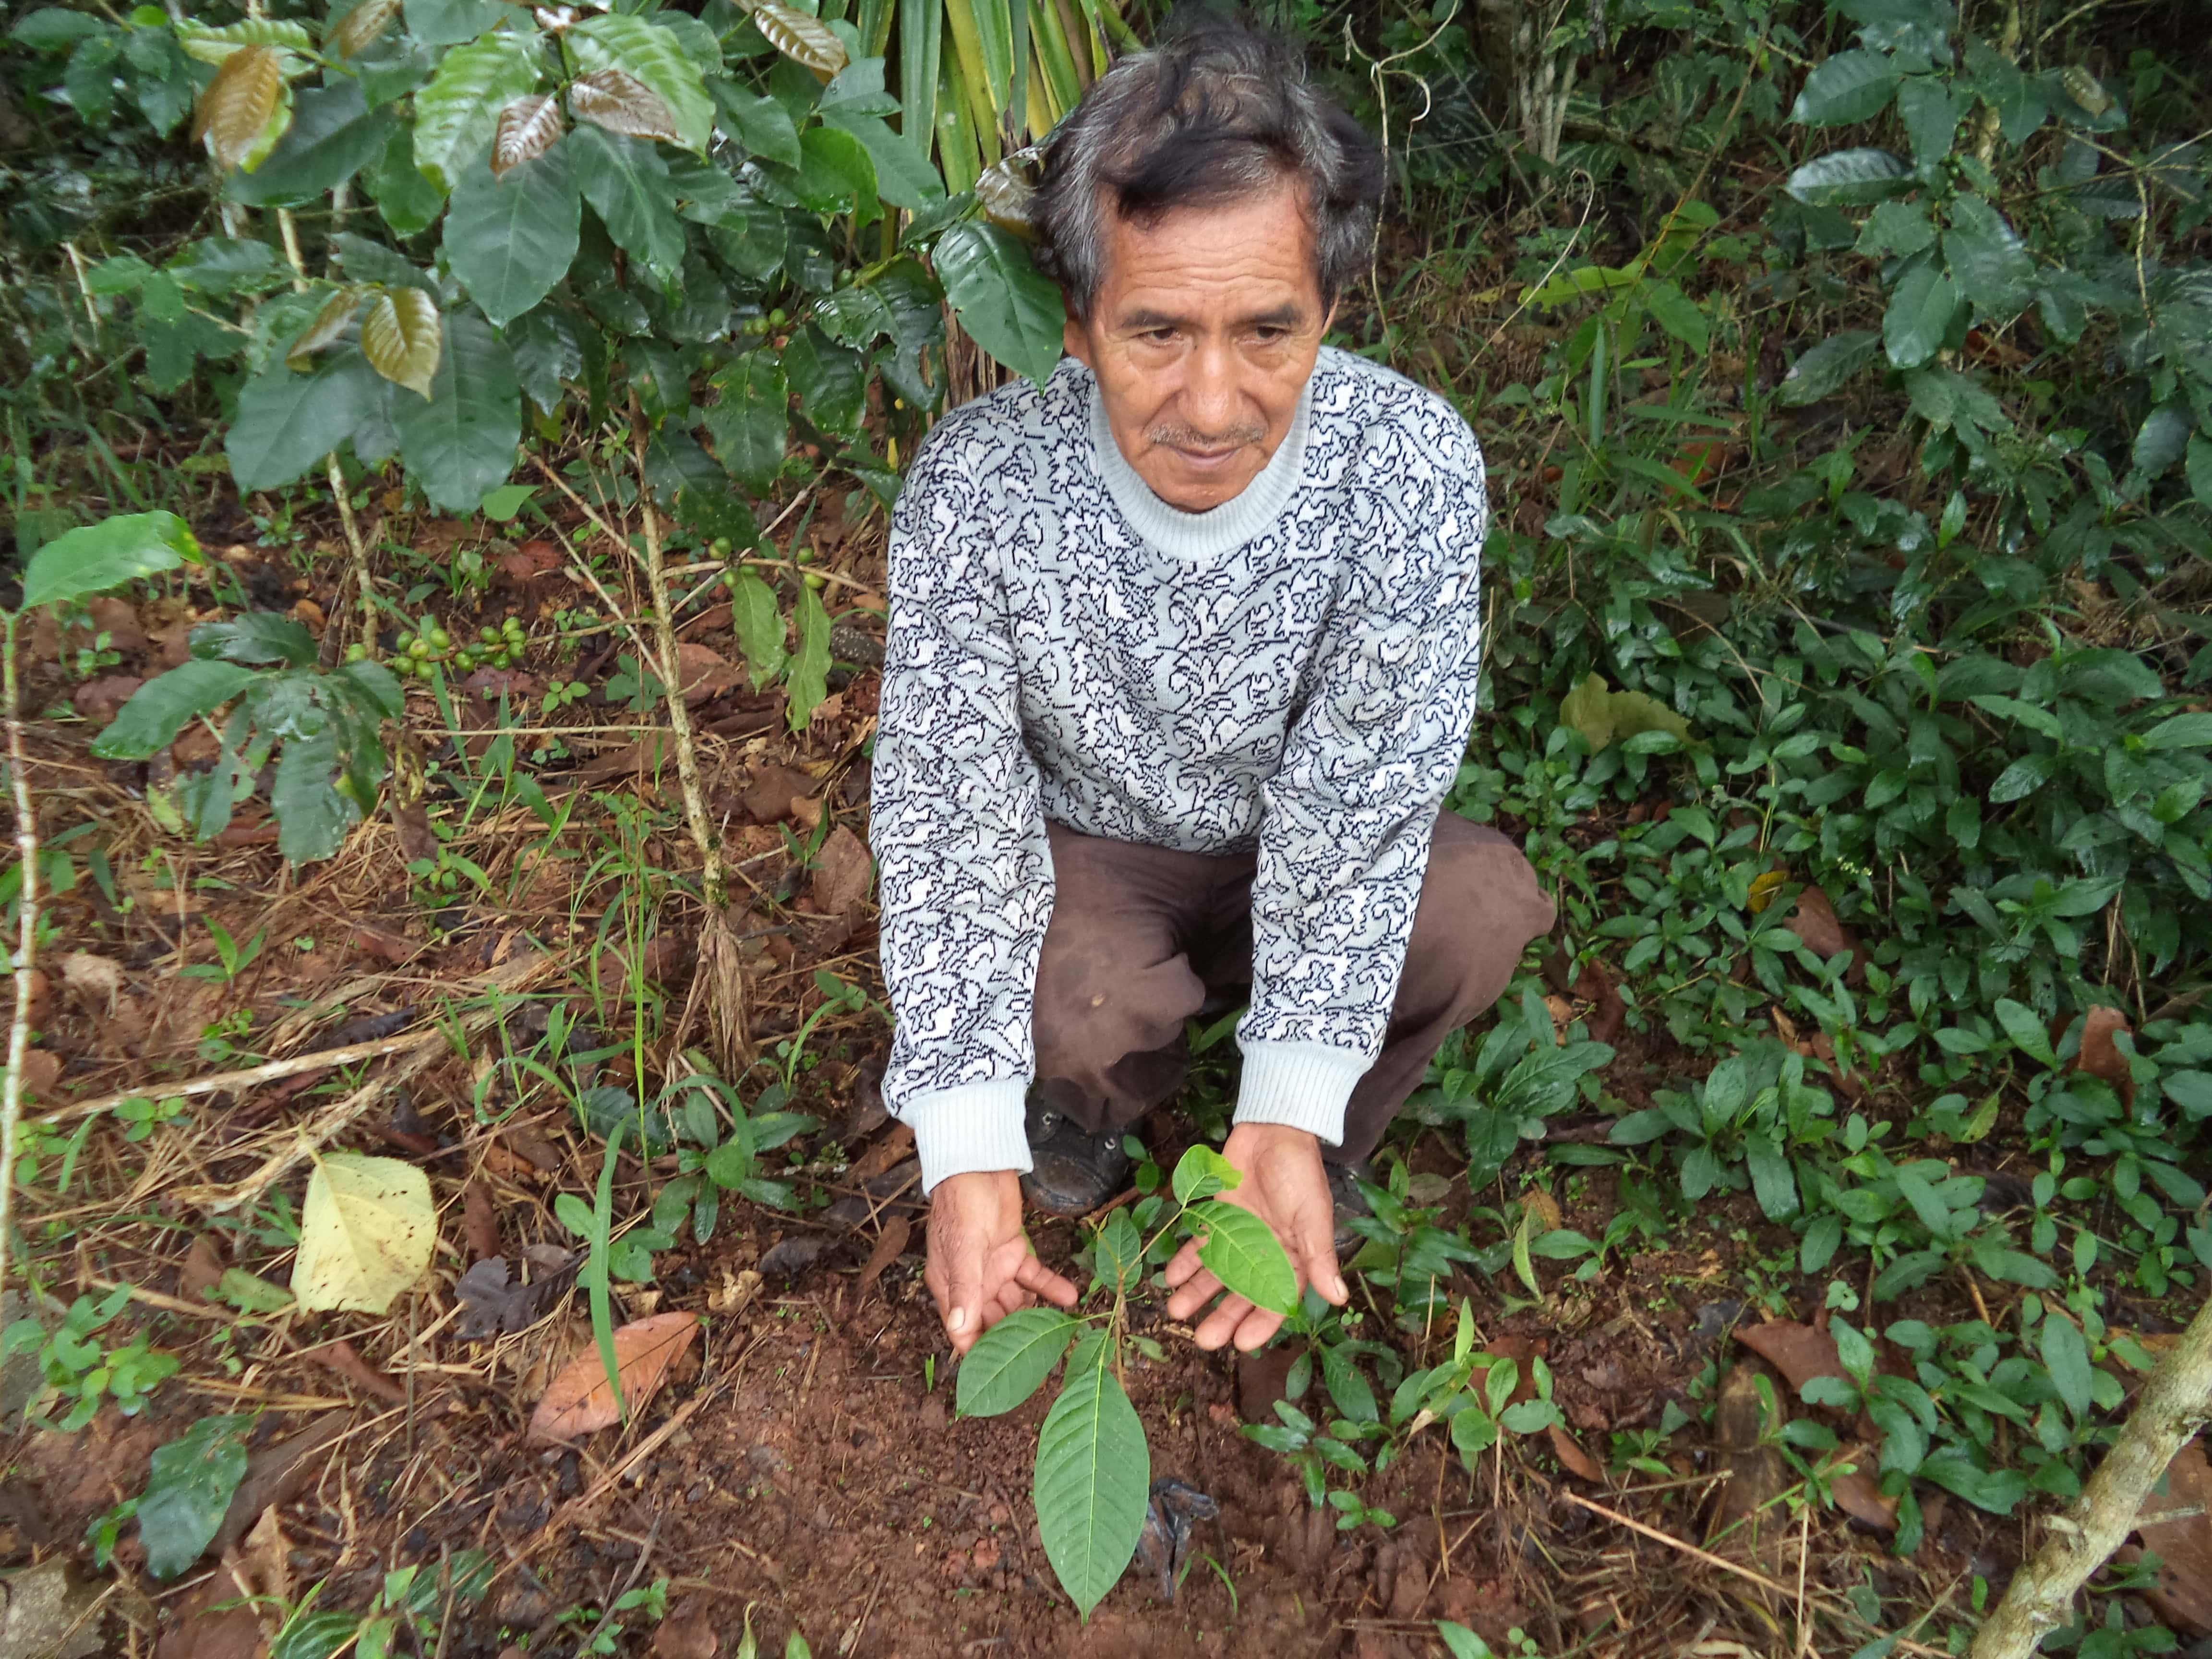 Pérou - Reforestacion Selva Central ©Frank Celi Montero 2017  (10).JPG